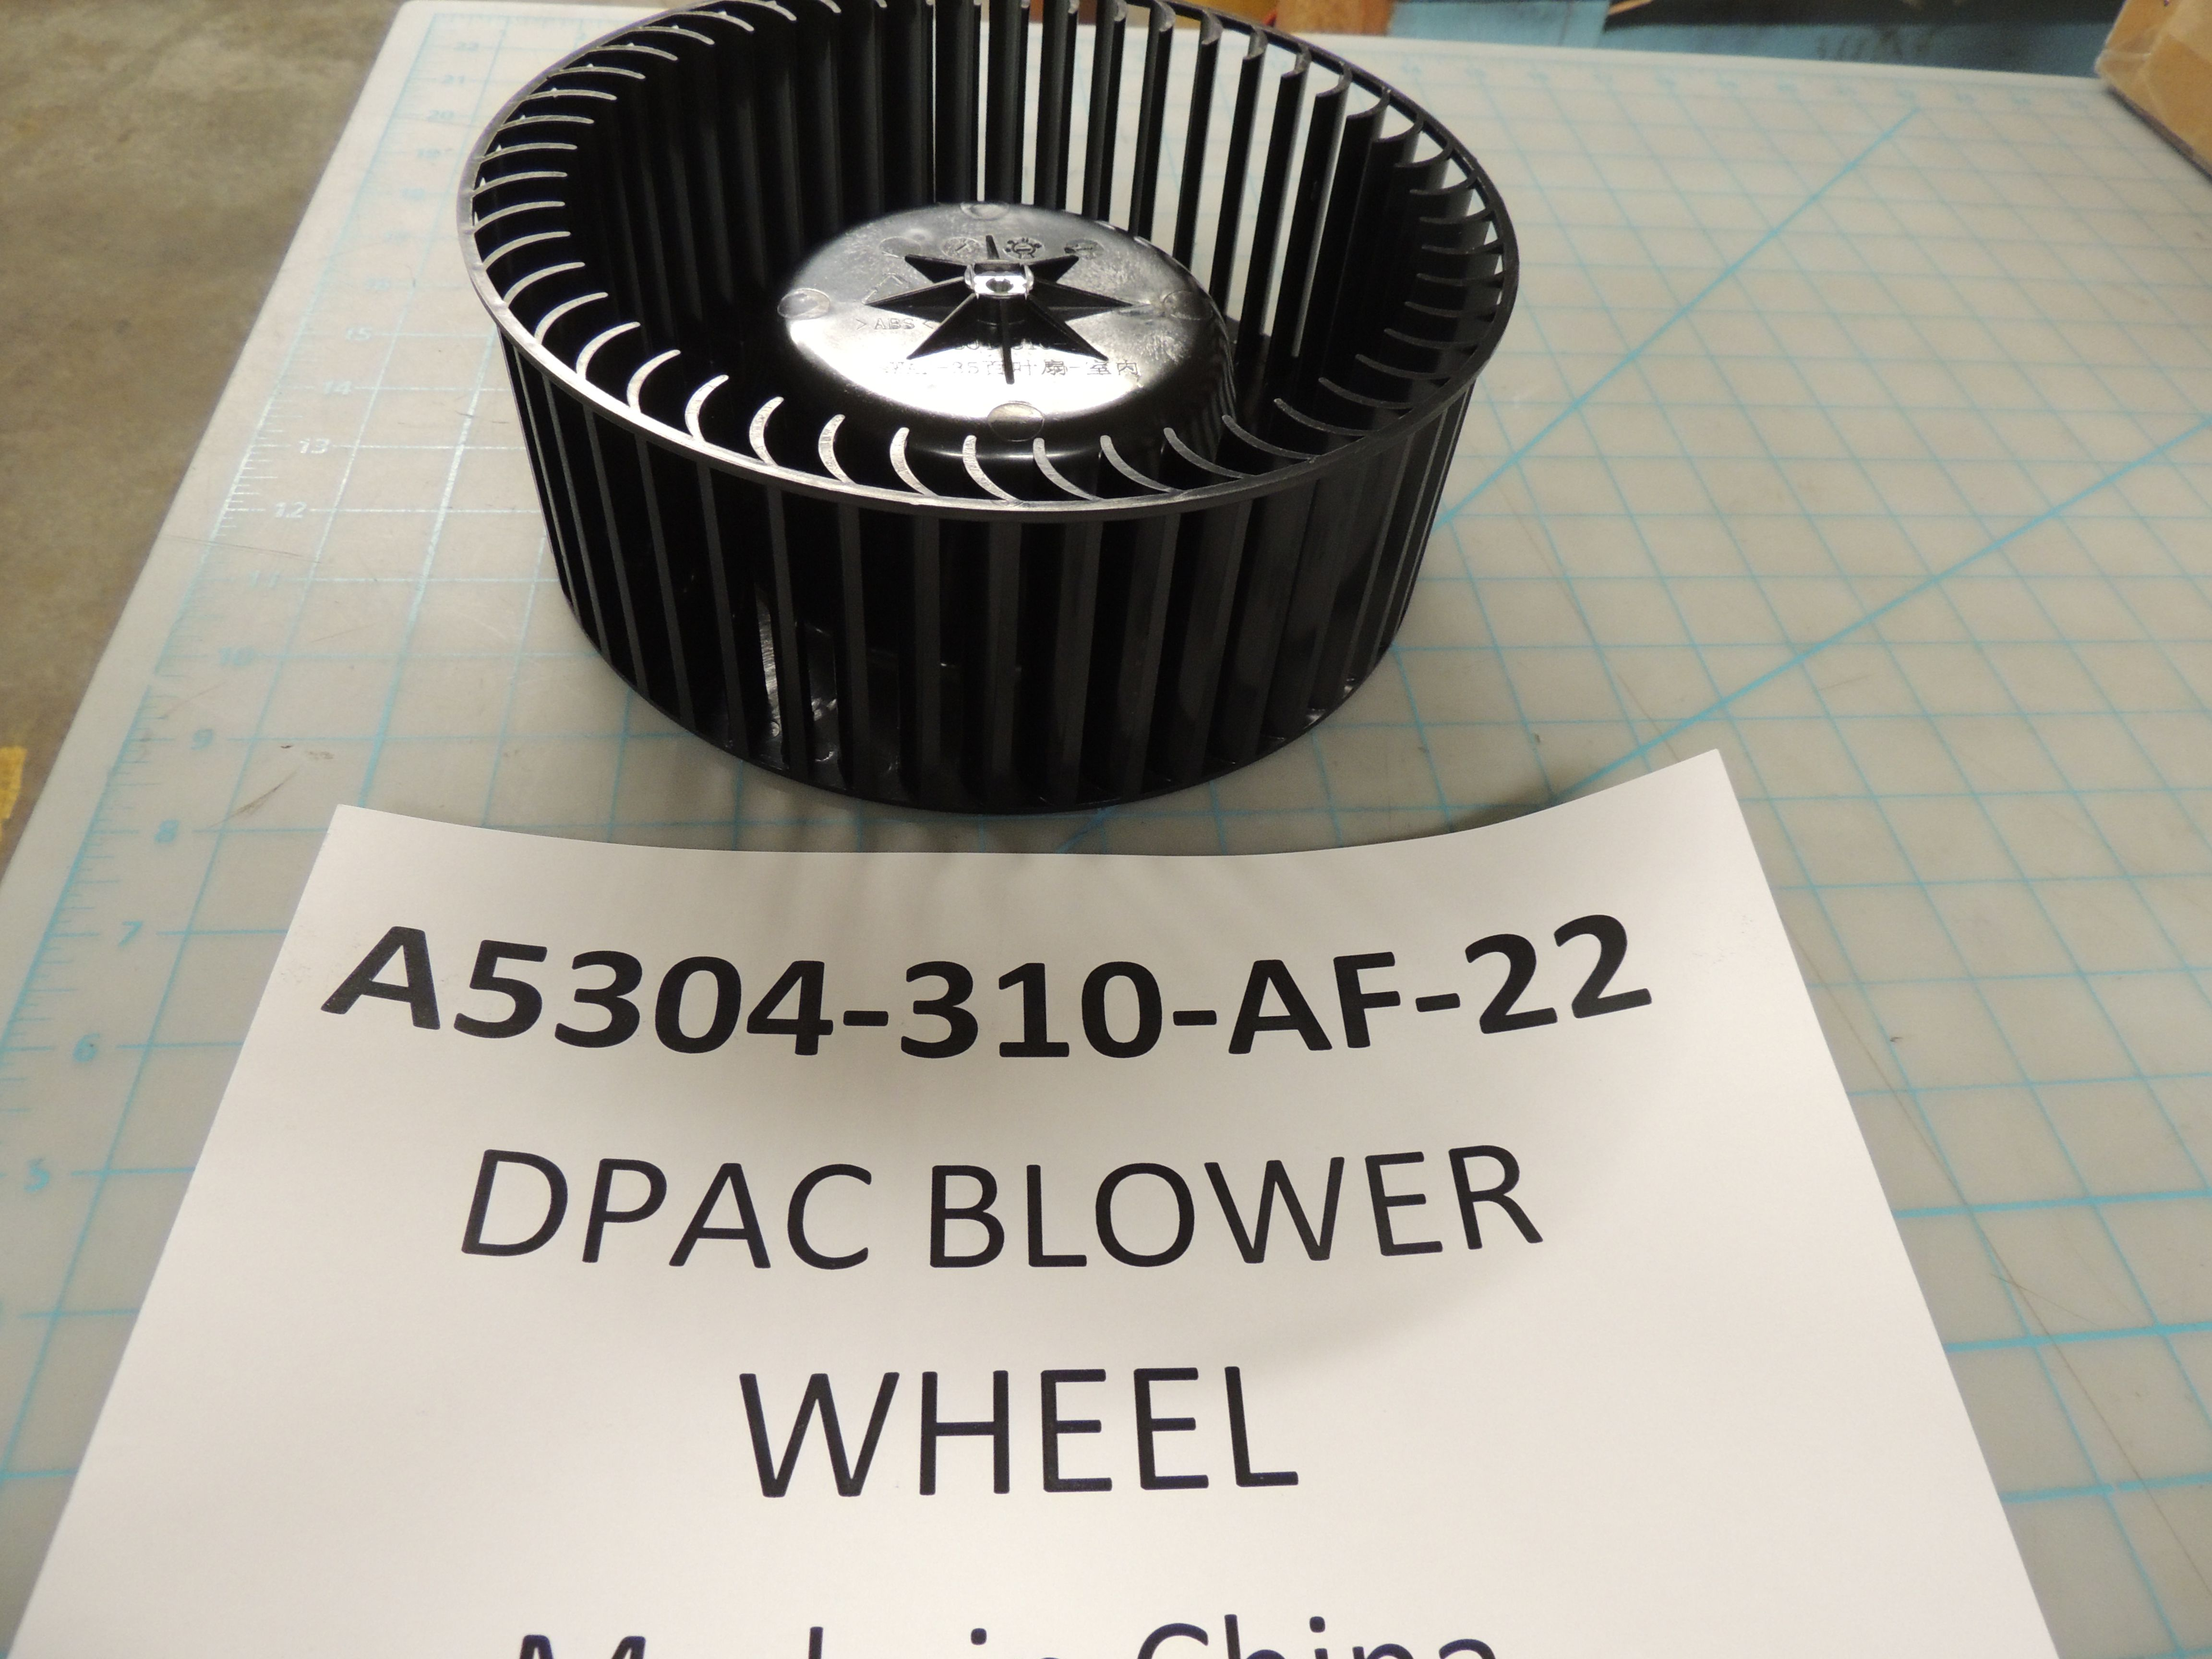 DPAC BLOWER WHEEL